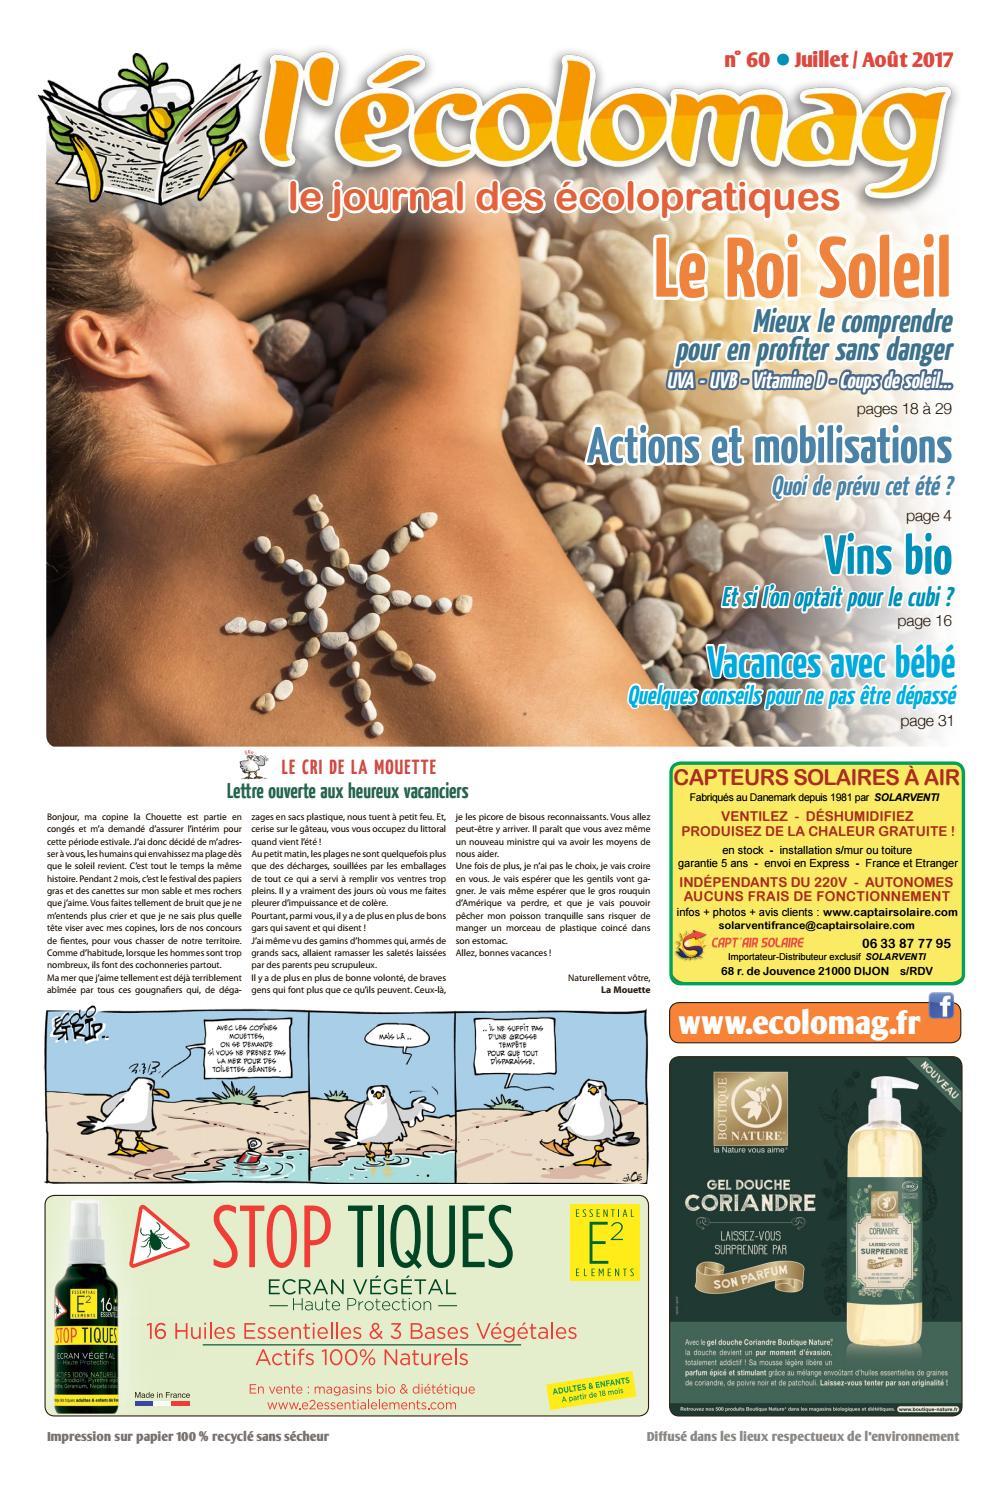 L Ecolomag n°60 by L Ecolomag - issuu fad753f5ba09